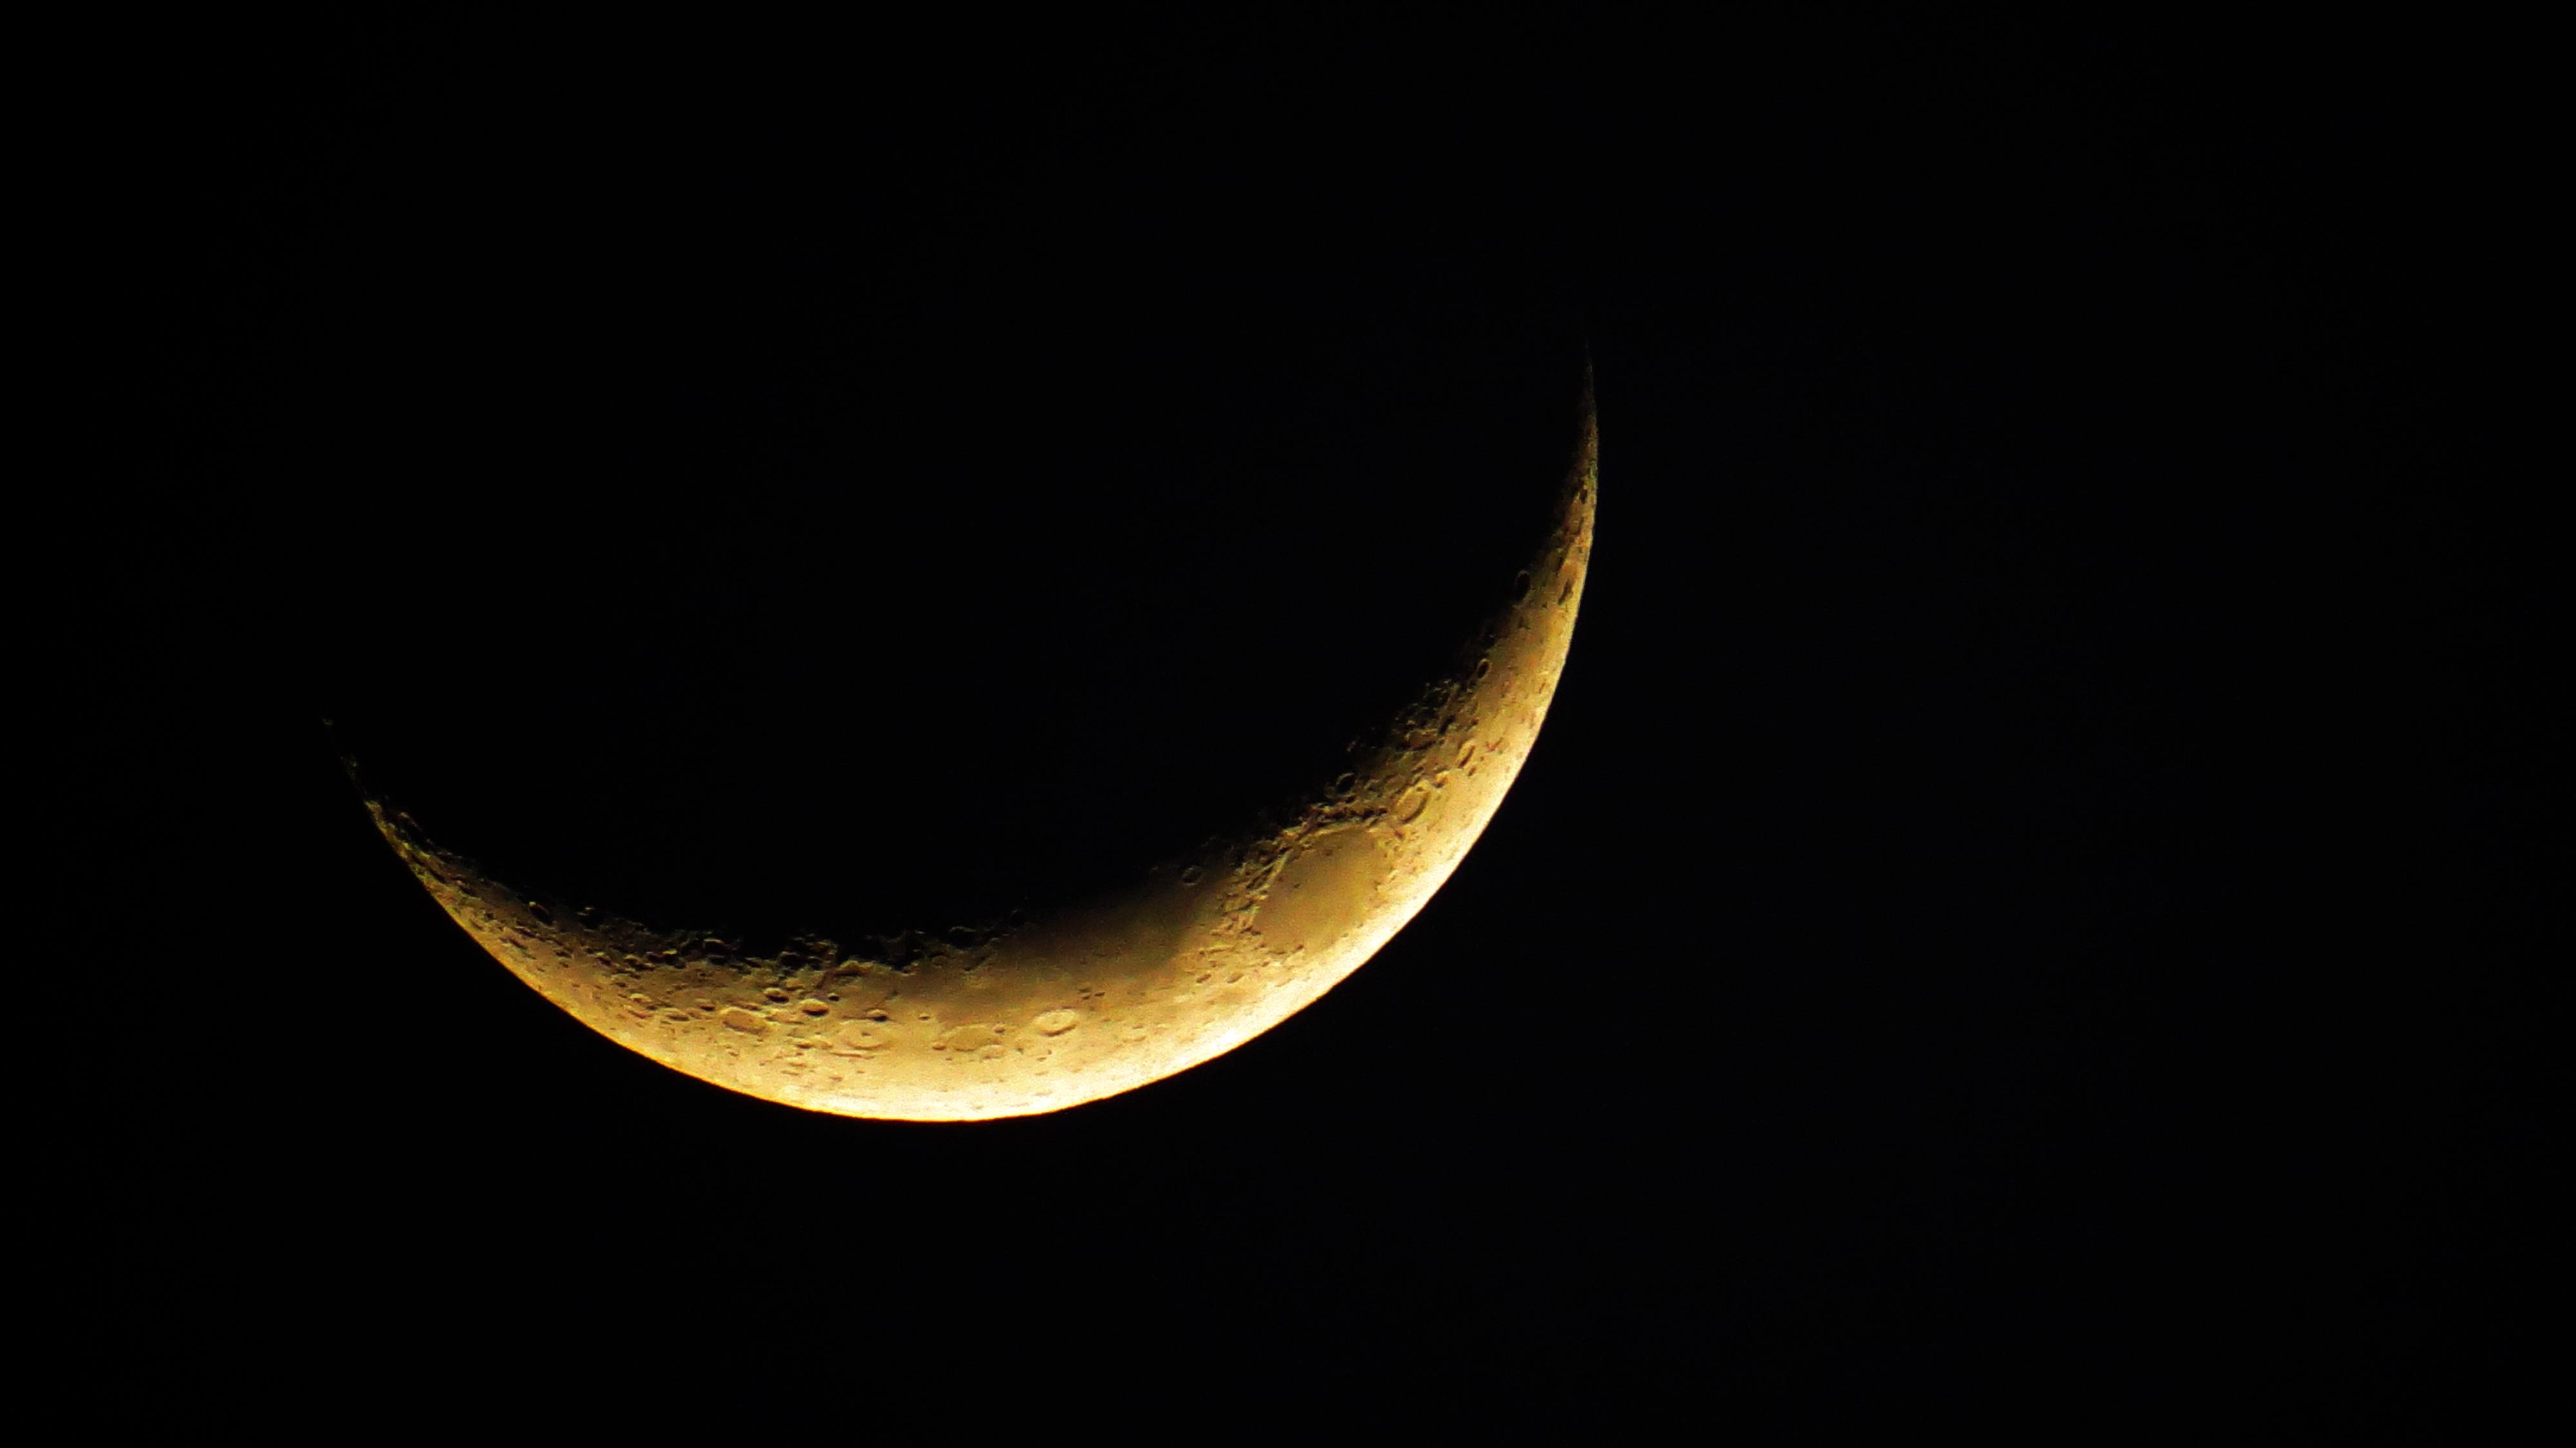 filethe crescent moonjpg wikimedia commons